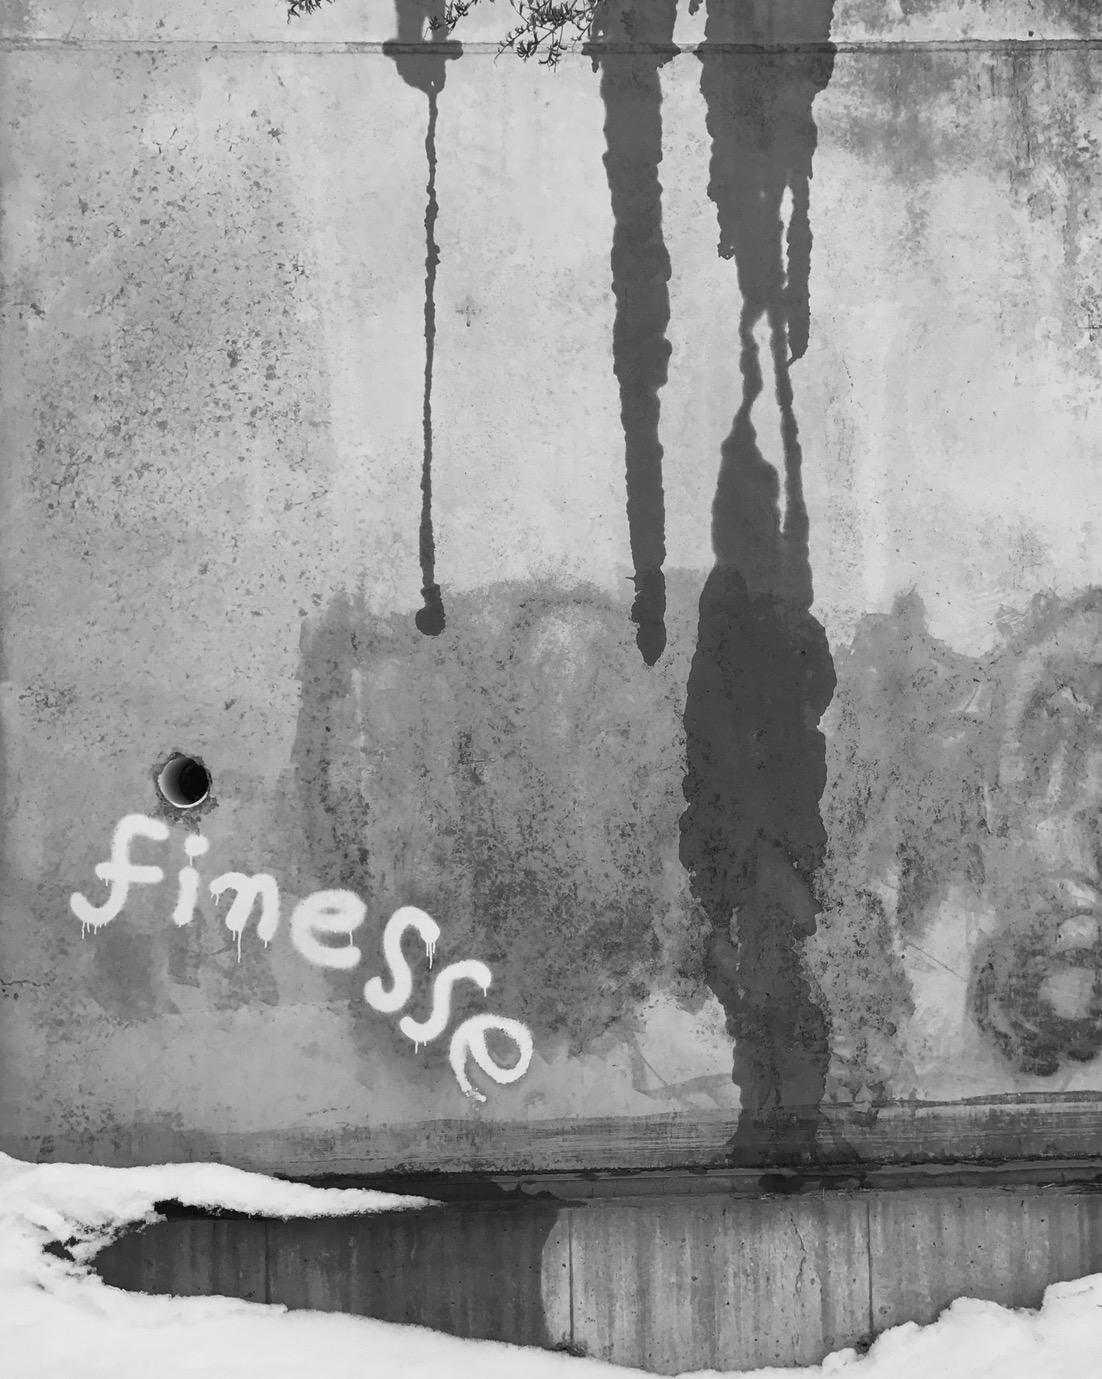 Finesse . iPhone 7+, Saratoga Springs, NY.©2017 Sean Walmsley